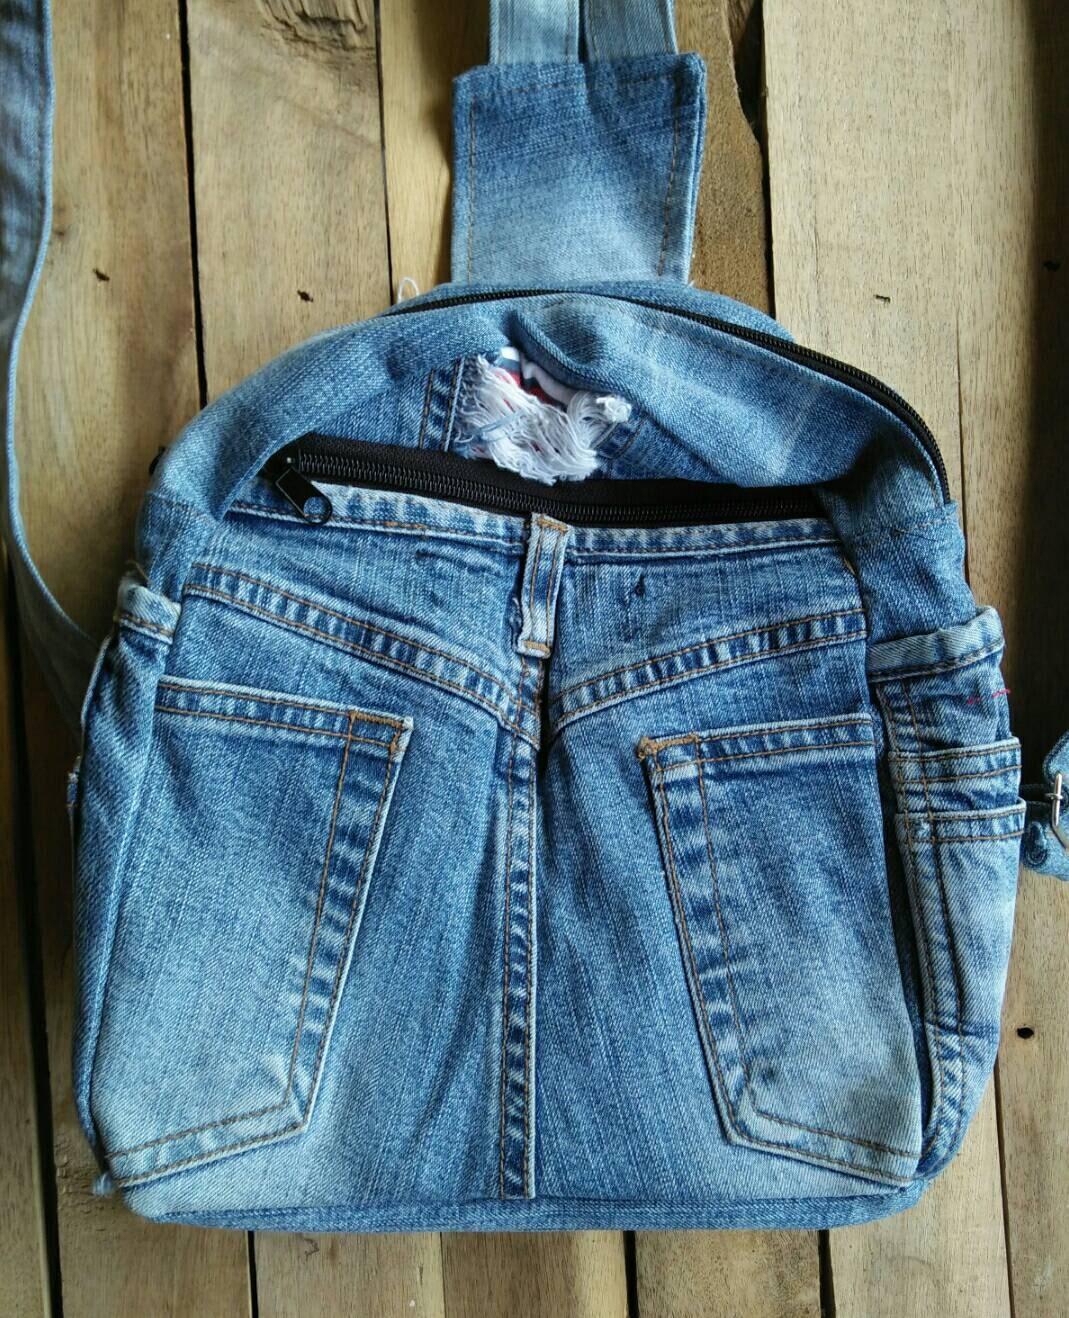 sac dos en denim jeans sac dos dames sac dos sac dos. Black Bedroom Furniture Sets. Home Design Ideas